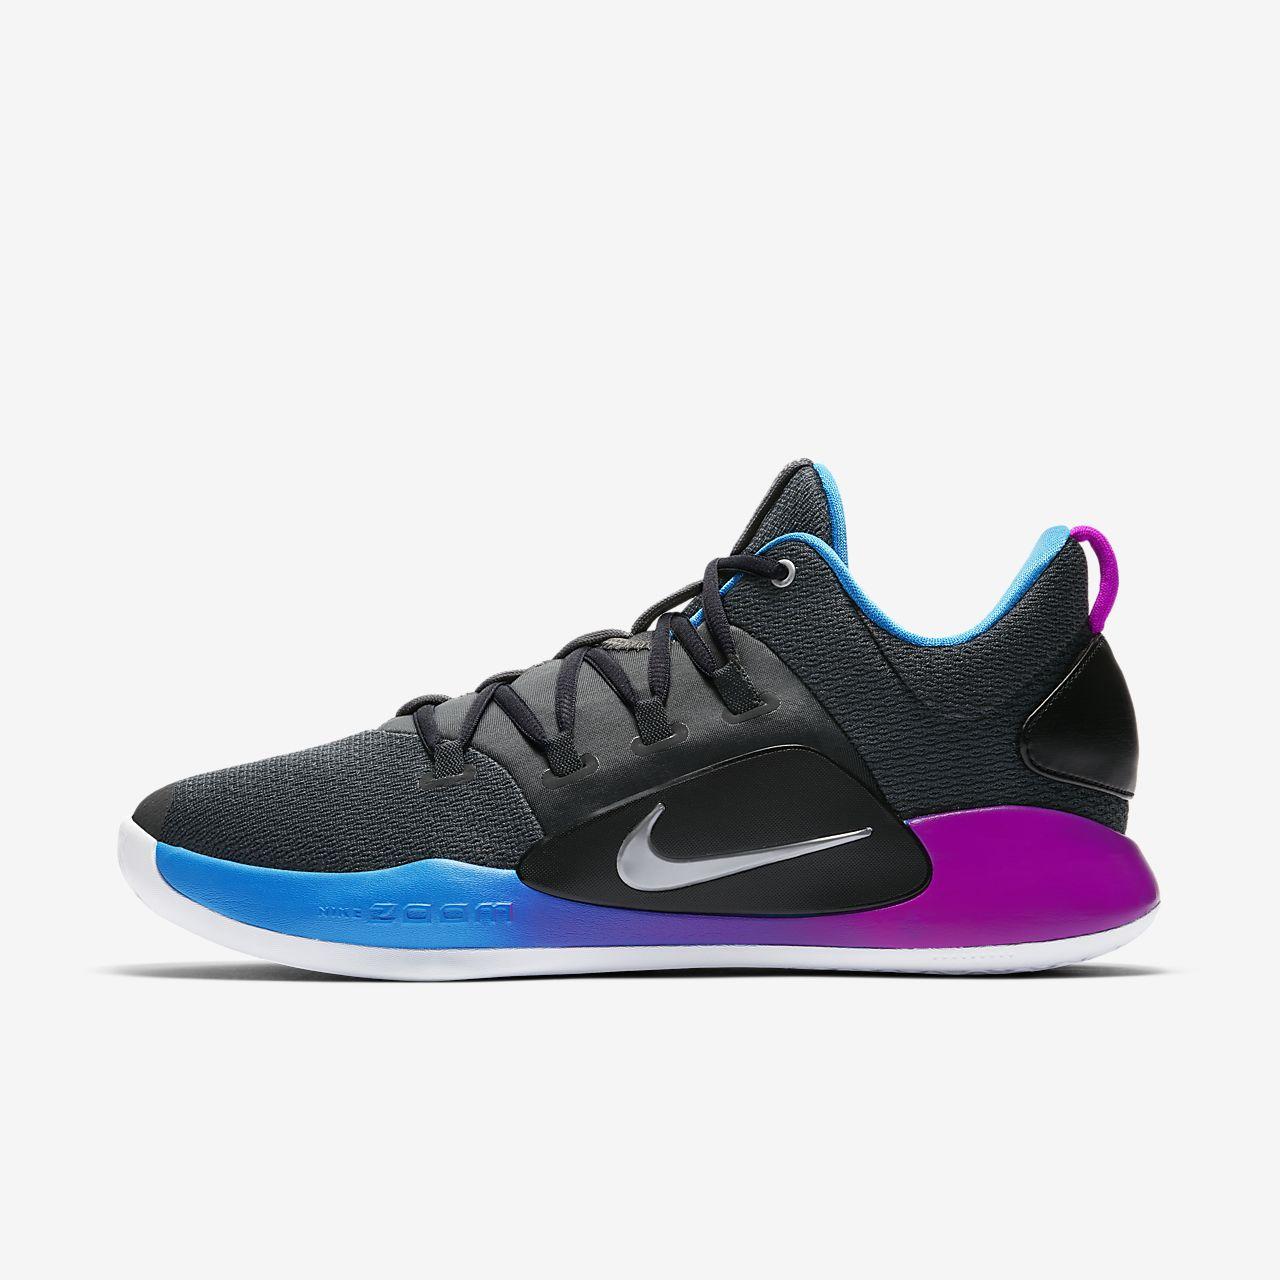 Homme Basketball Pour Chaussure De X Hyperdunk Nike Be Low qw0Z5B